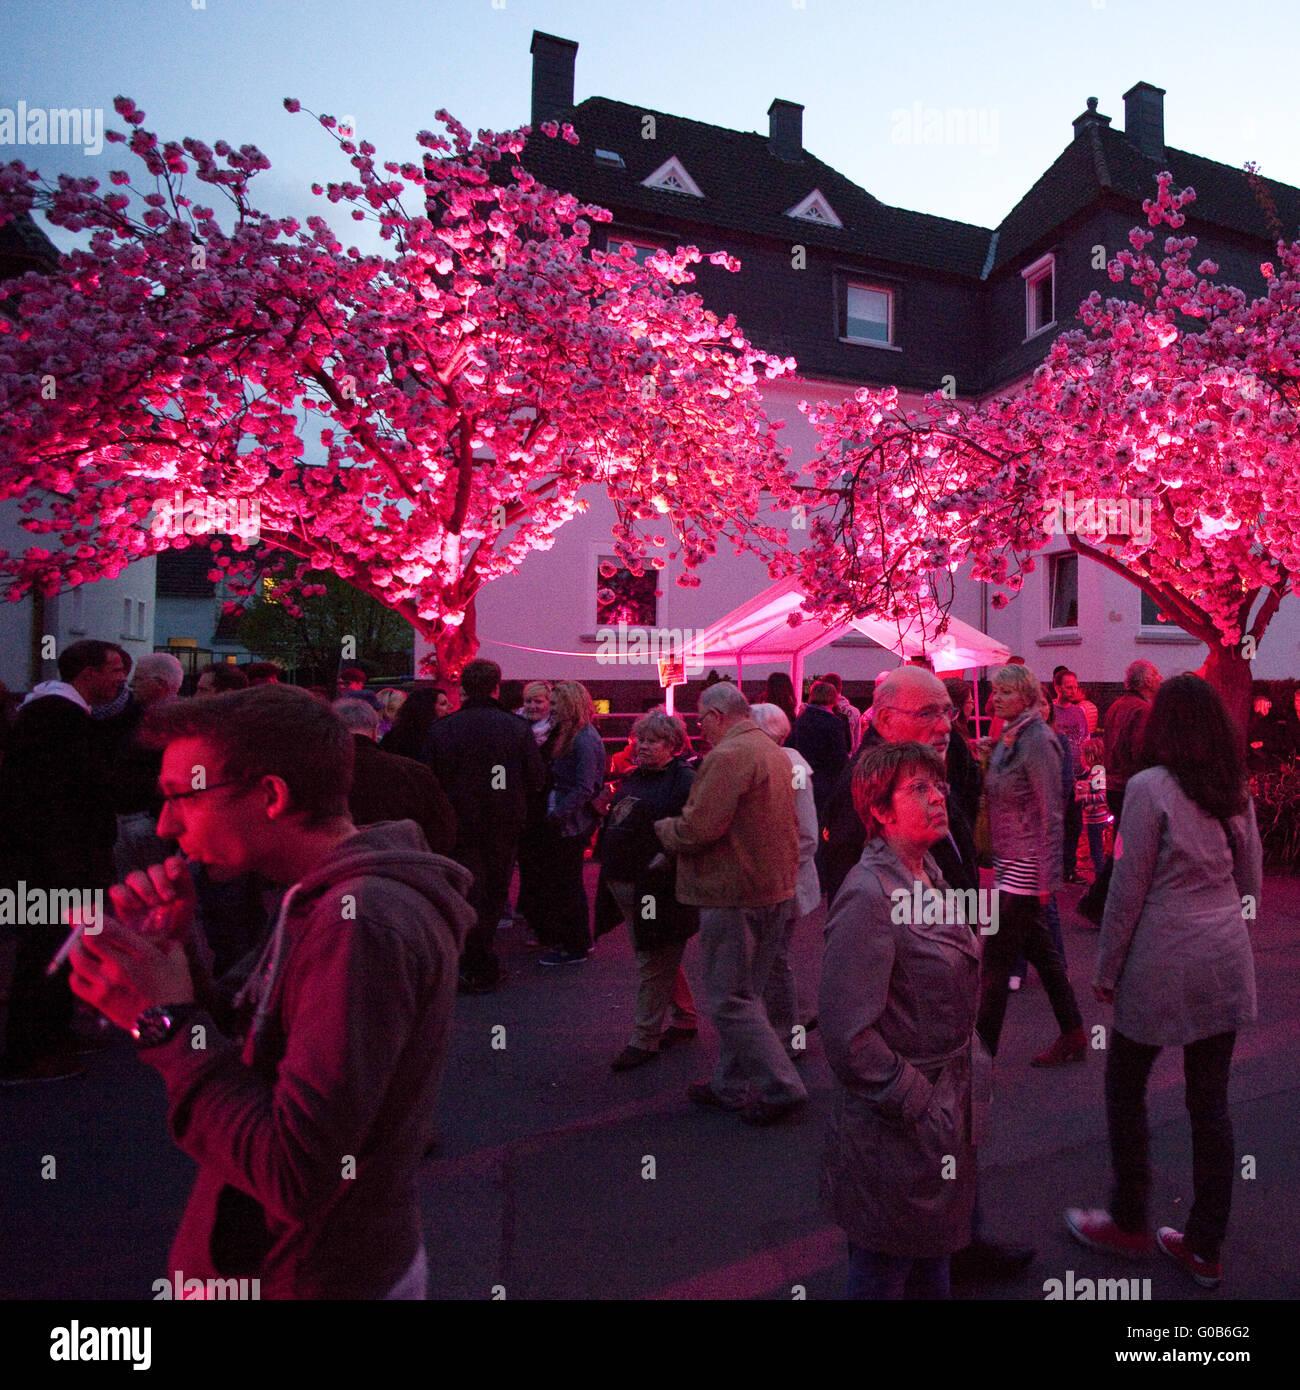 Event Cherry Blossom Festival, Schwerte, Germany - Stock Image